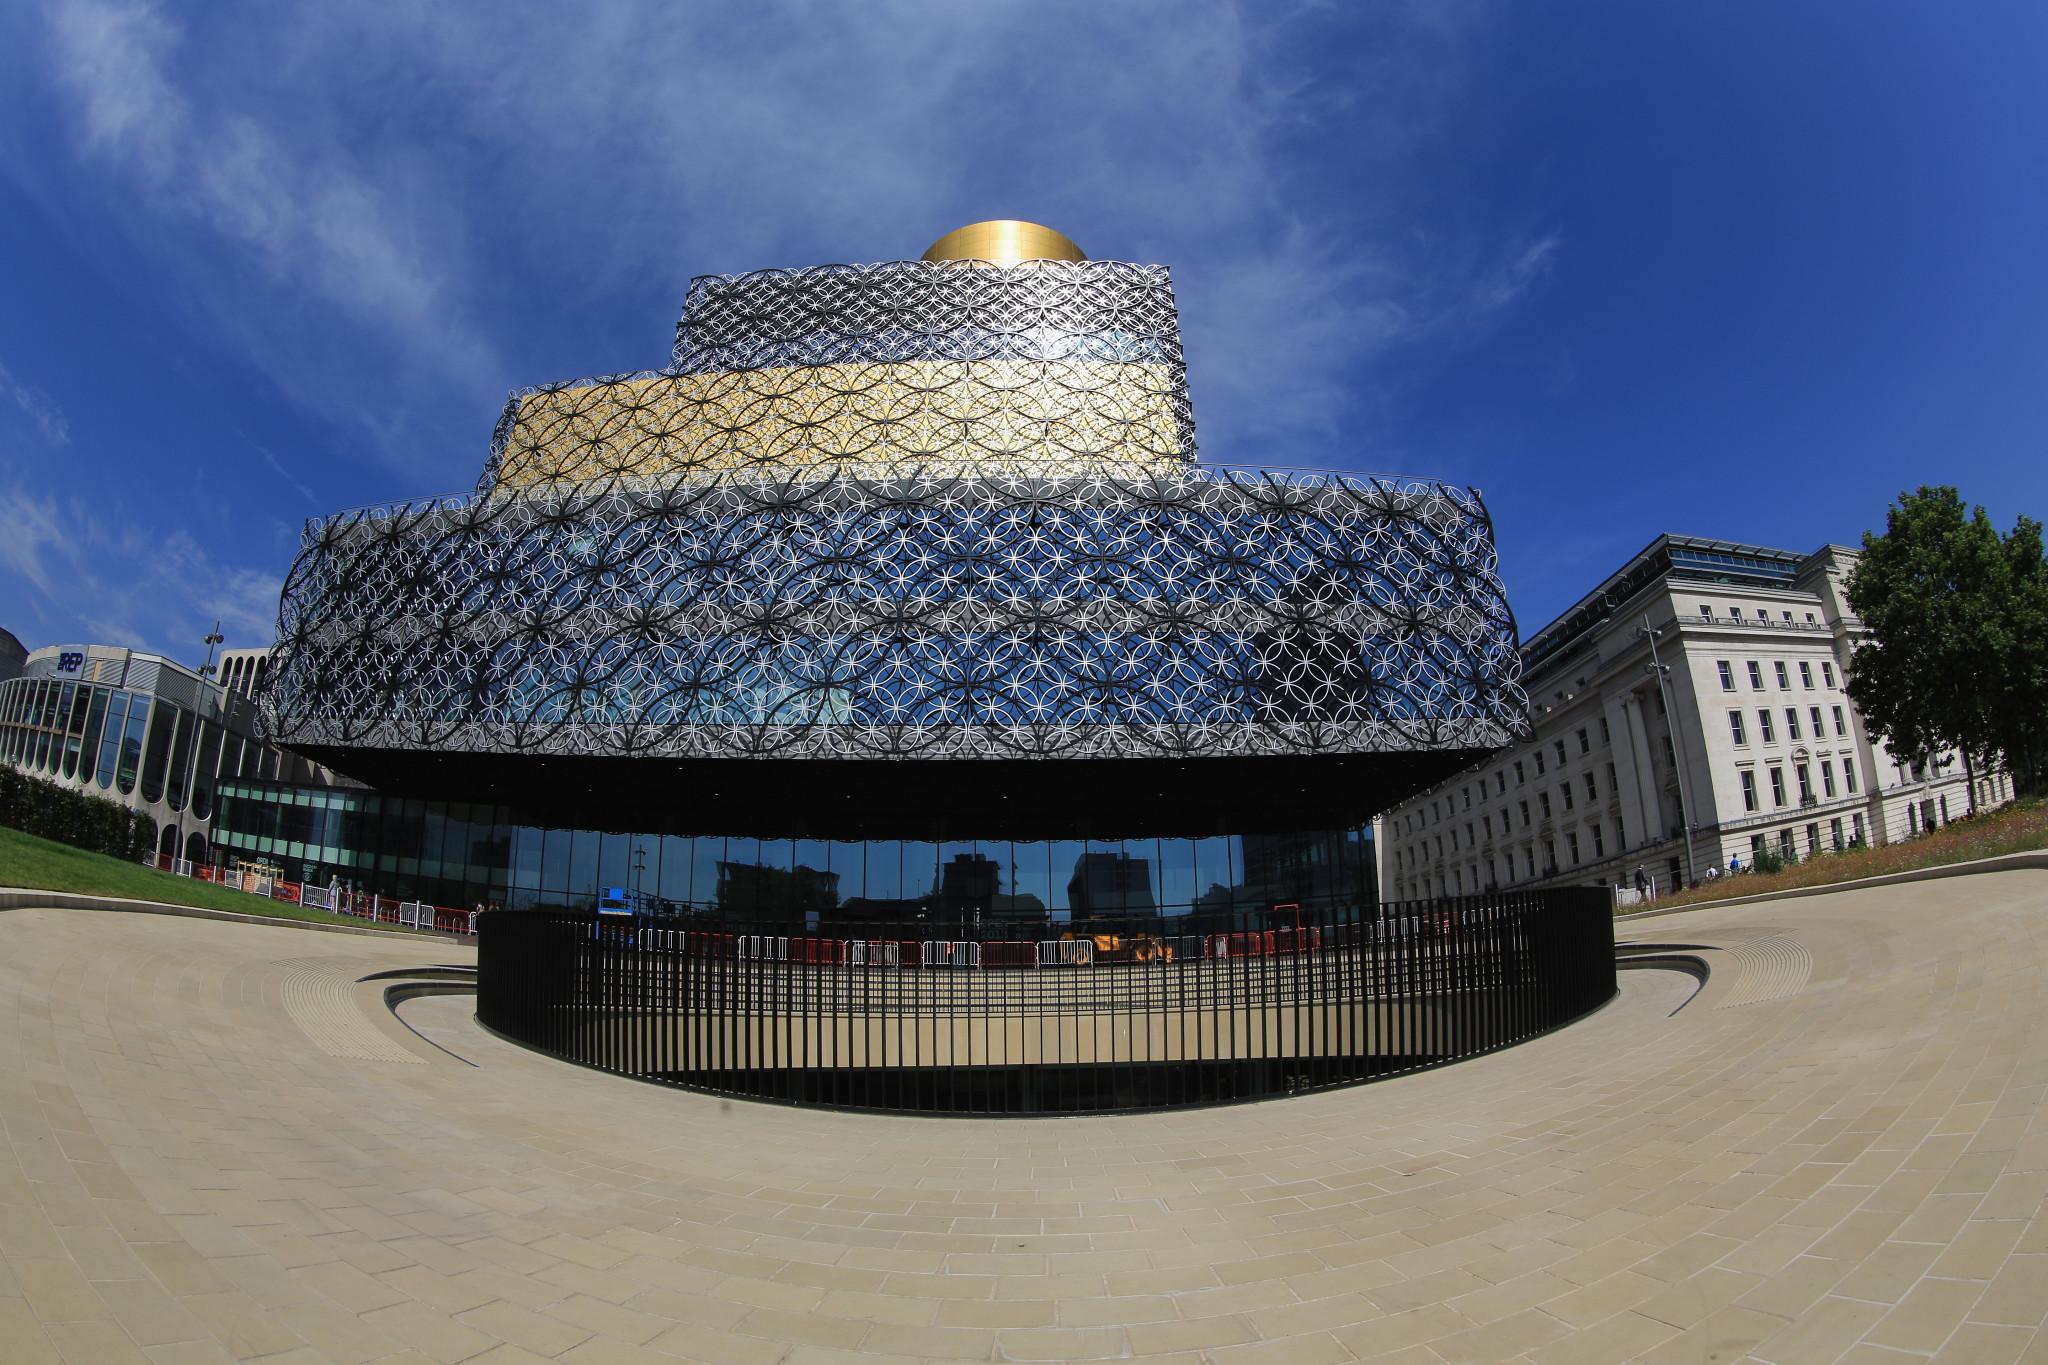 Birmingham 2022 cultural partner 'The Walk' sees Little Amal begin journey across Europe